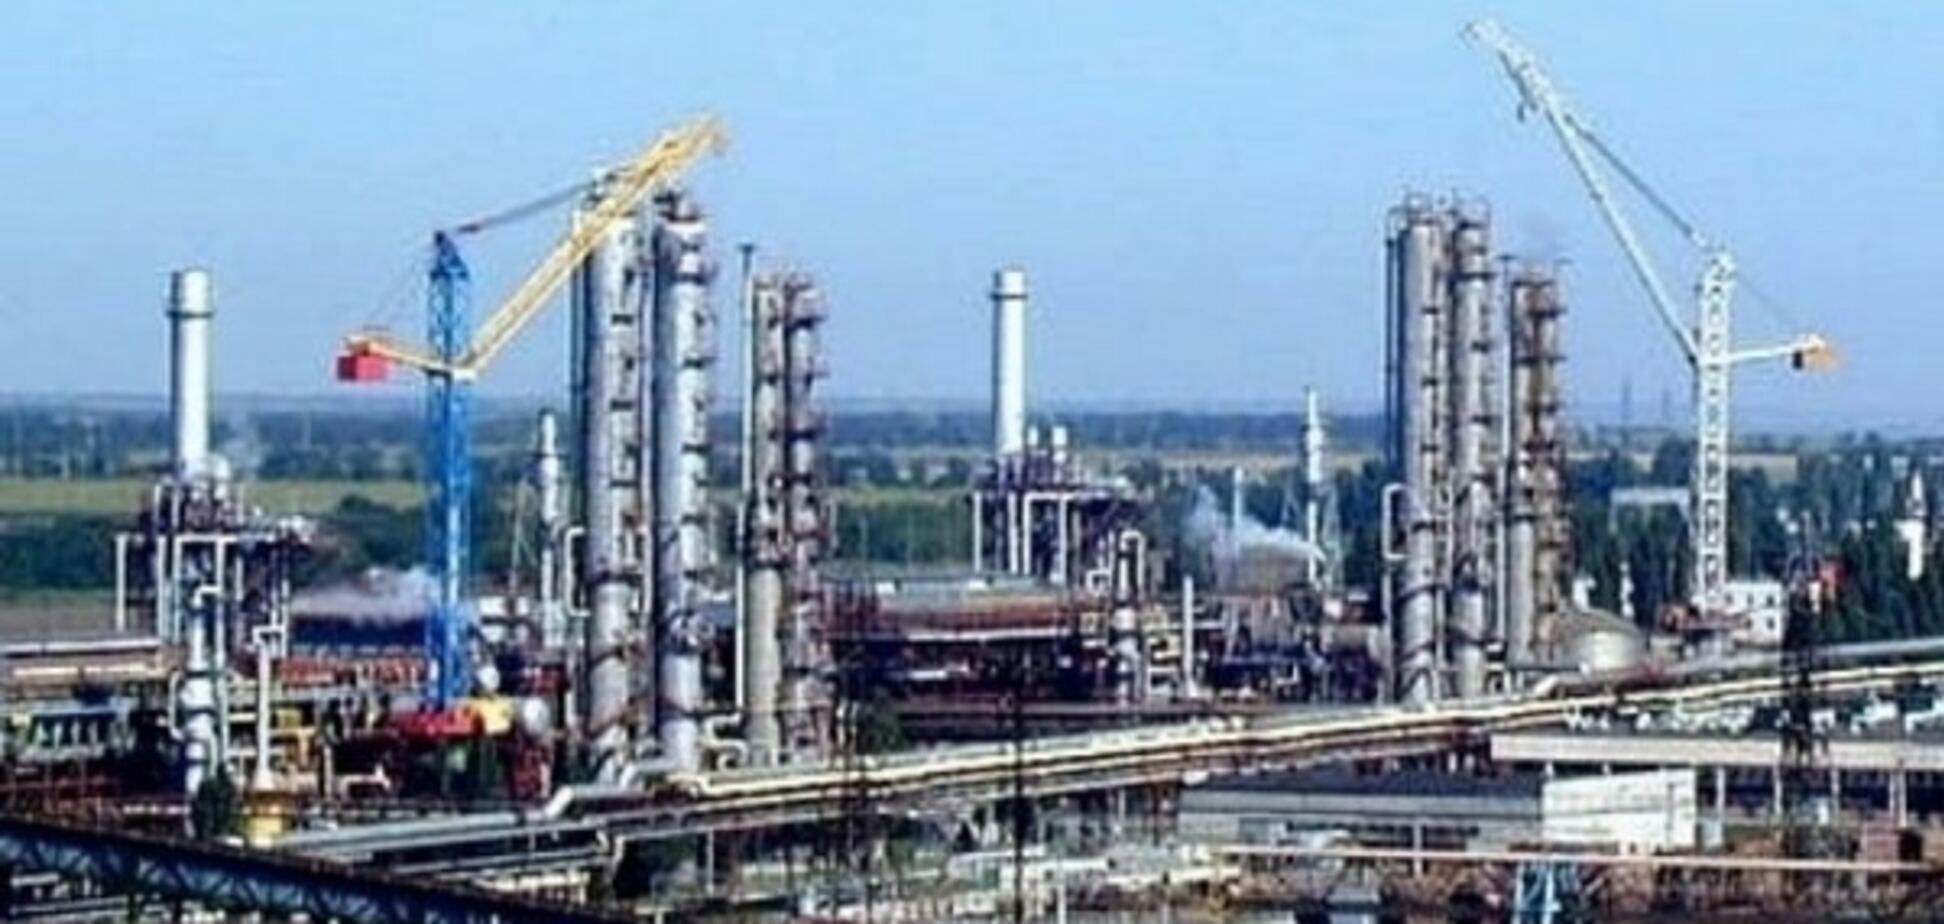 Генпрокуратура влаштувала обшук Одеського припортового заводу